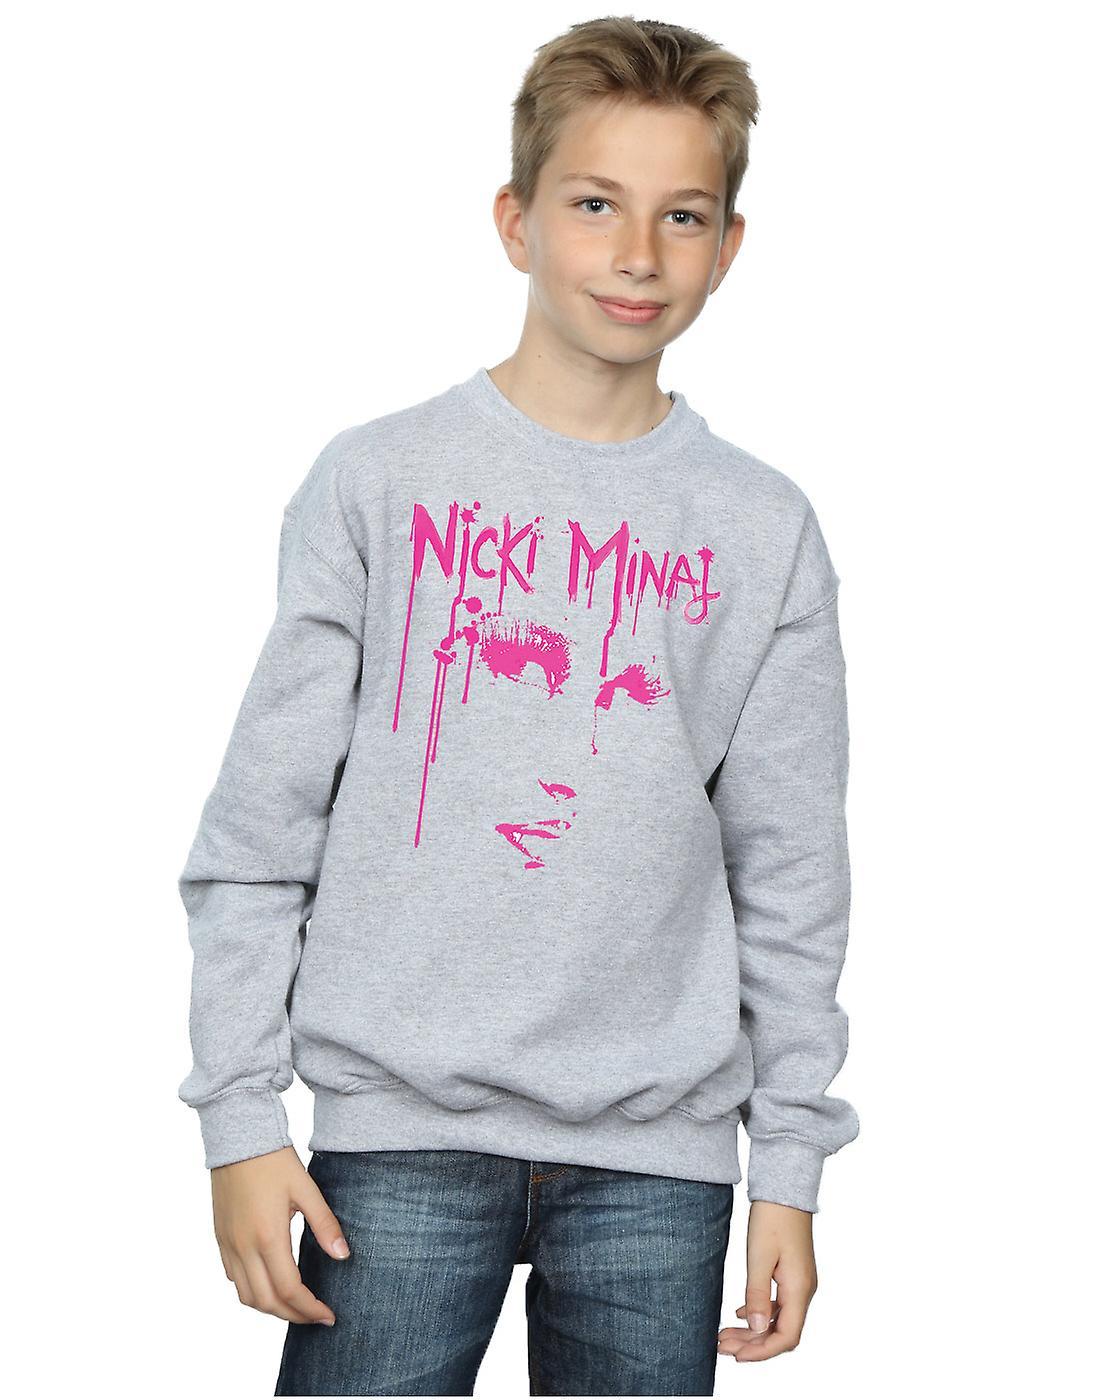 Nicki Minaj Boys Face Drip Sweatshirt